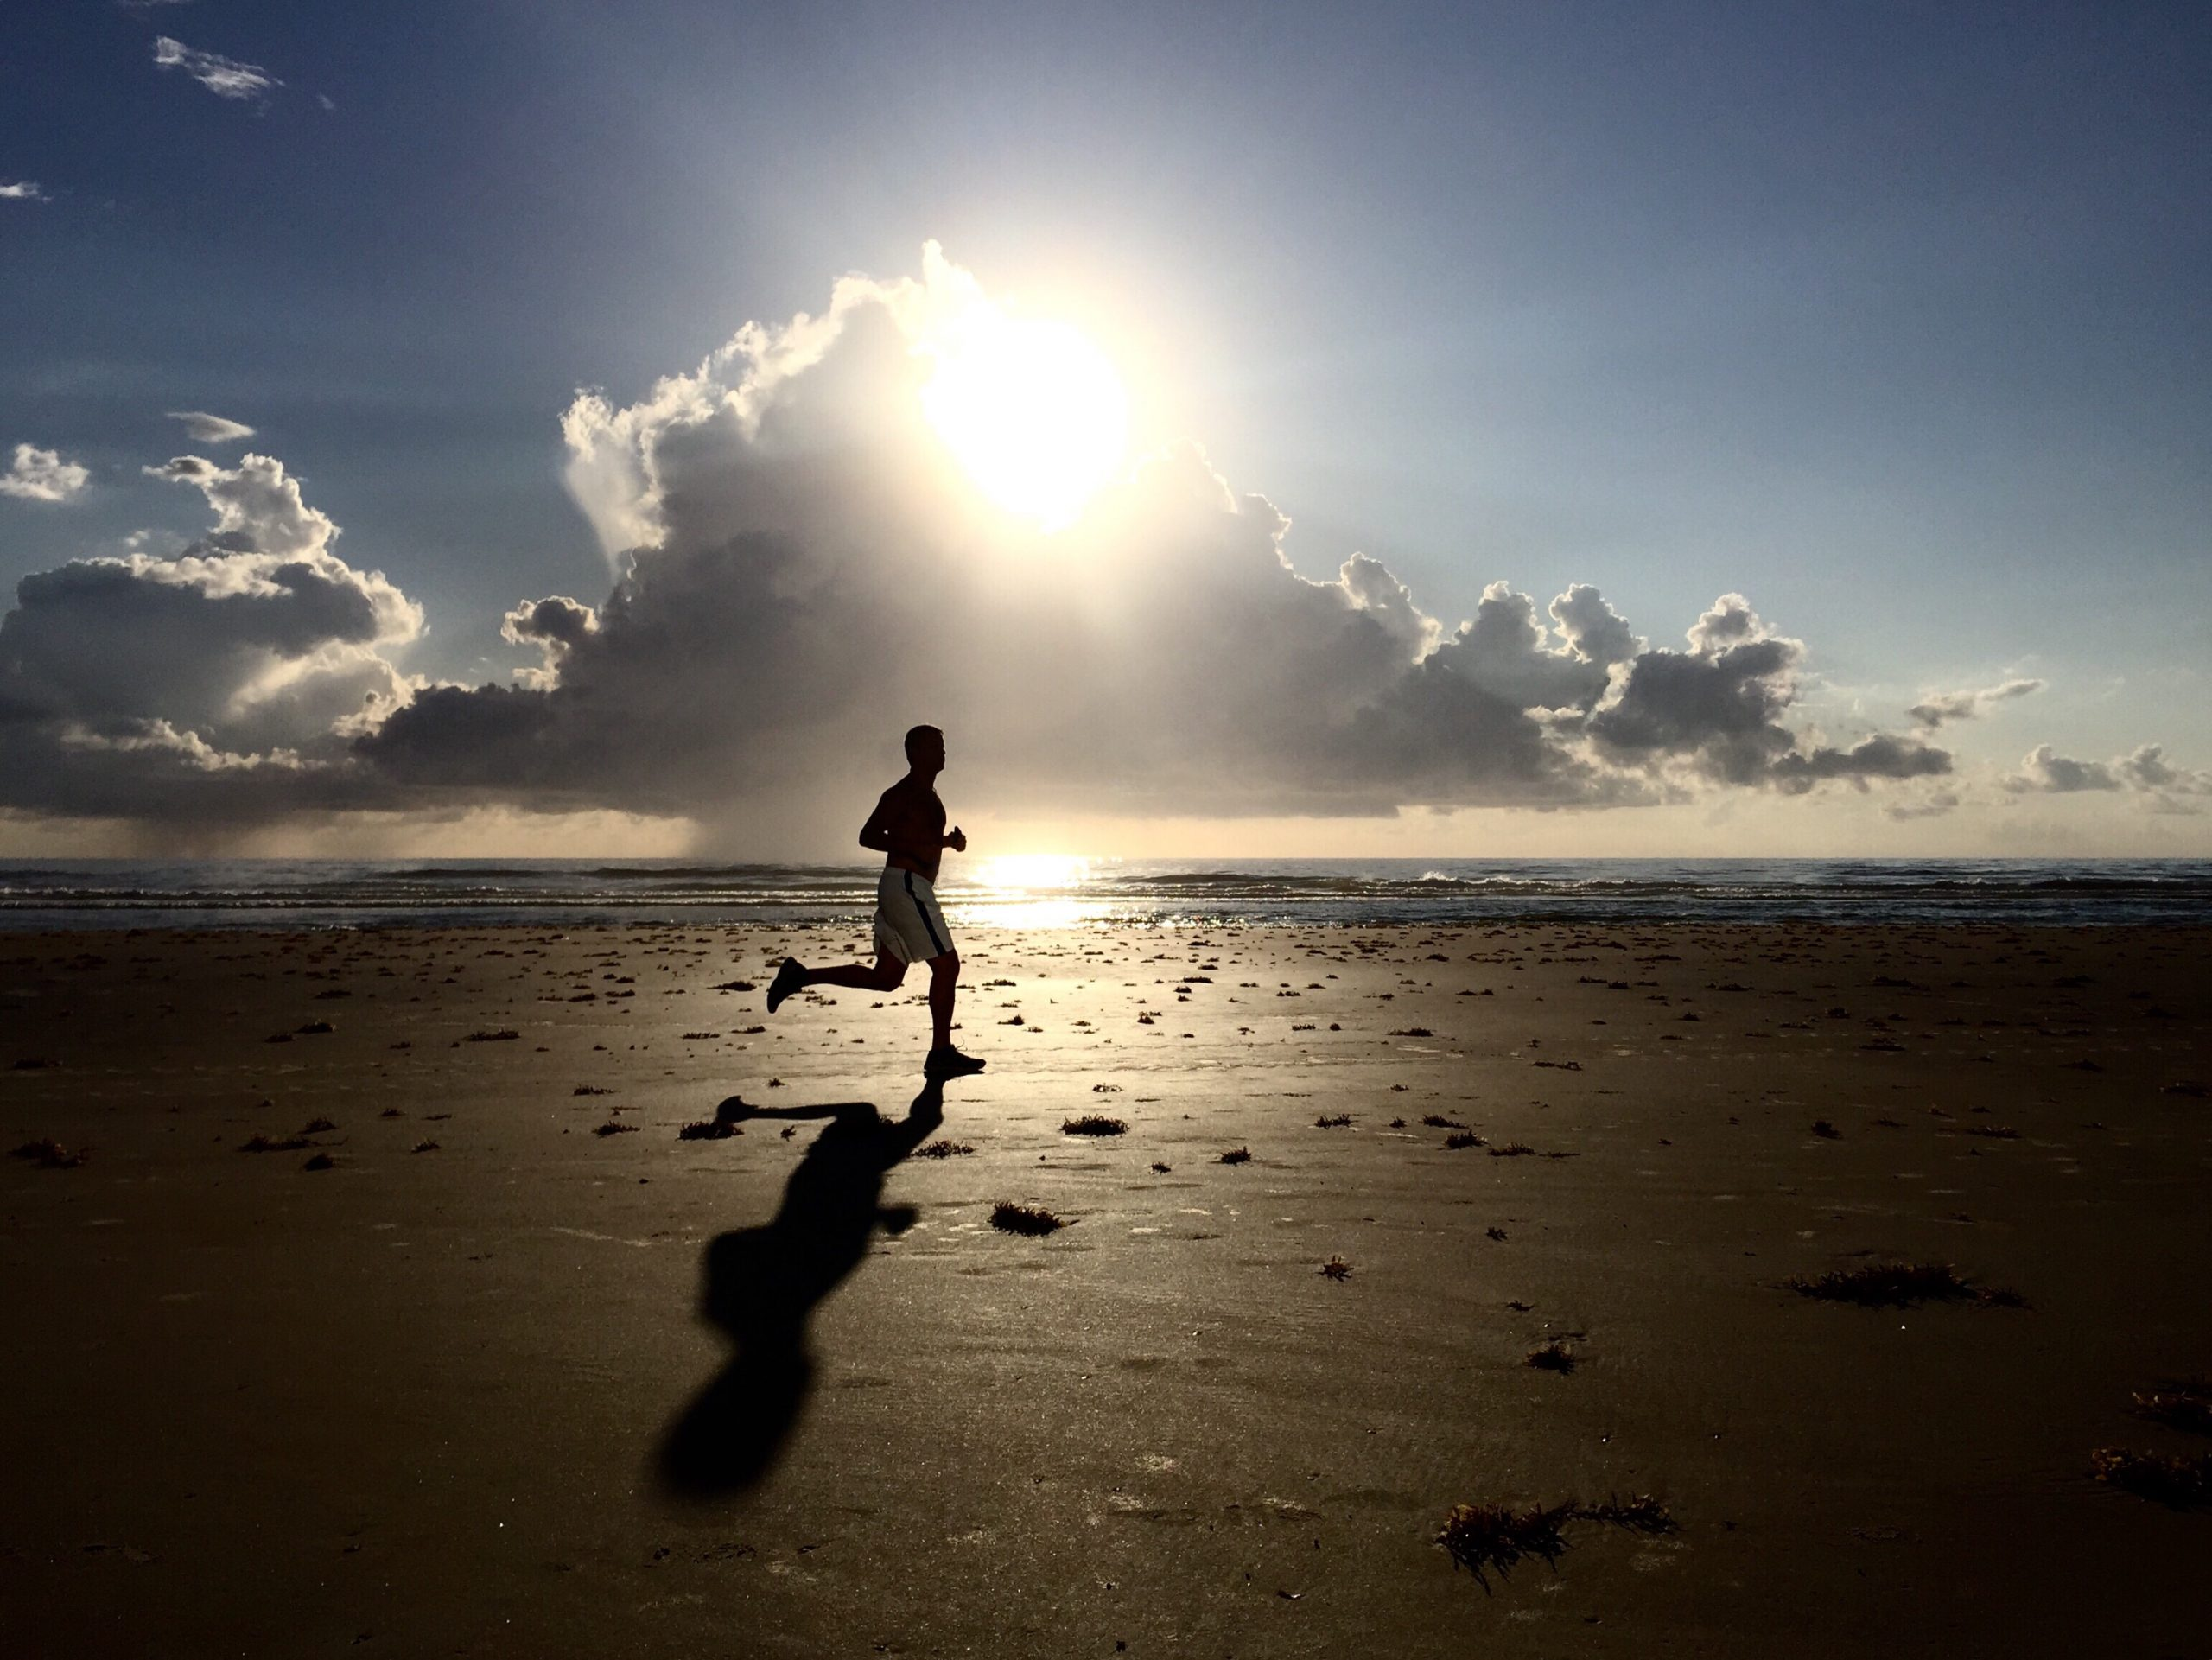 Qatari runner sets new 'fastest known time' for run around Qatar